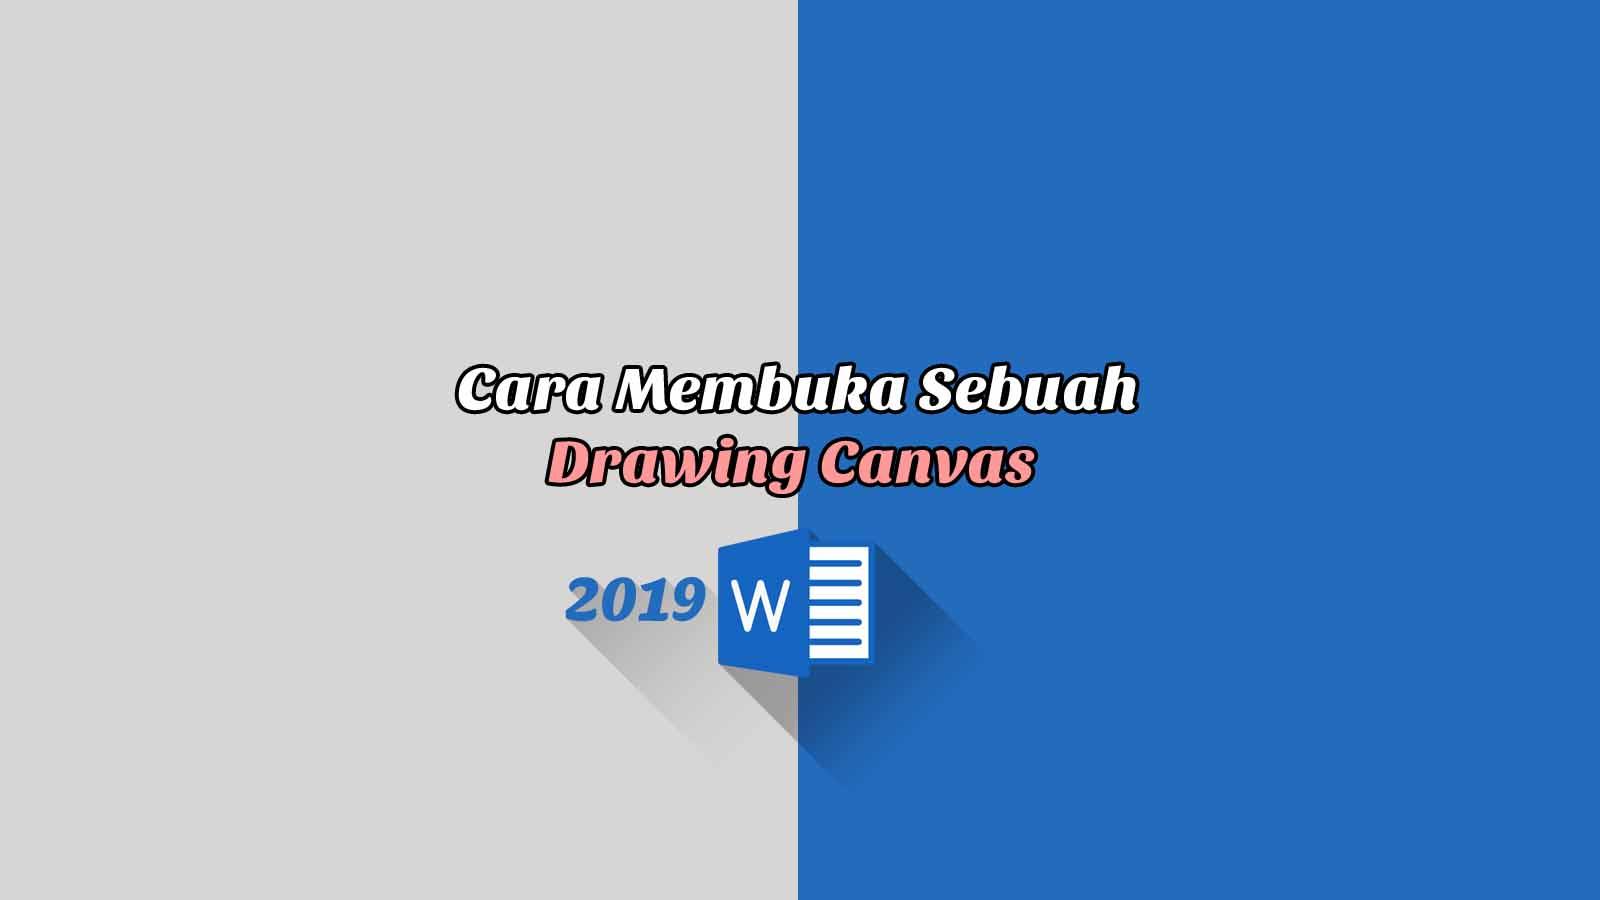 Cara Membuka Sebuah Drawing Canvas - Word 2019